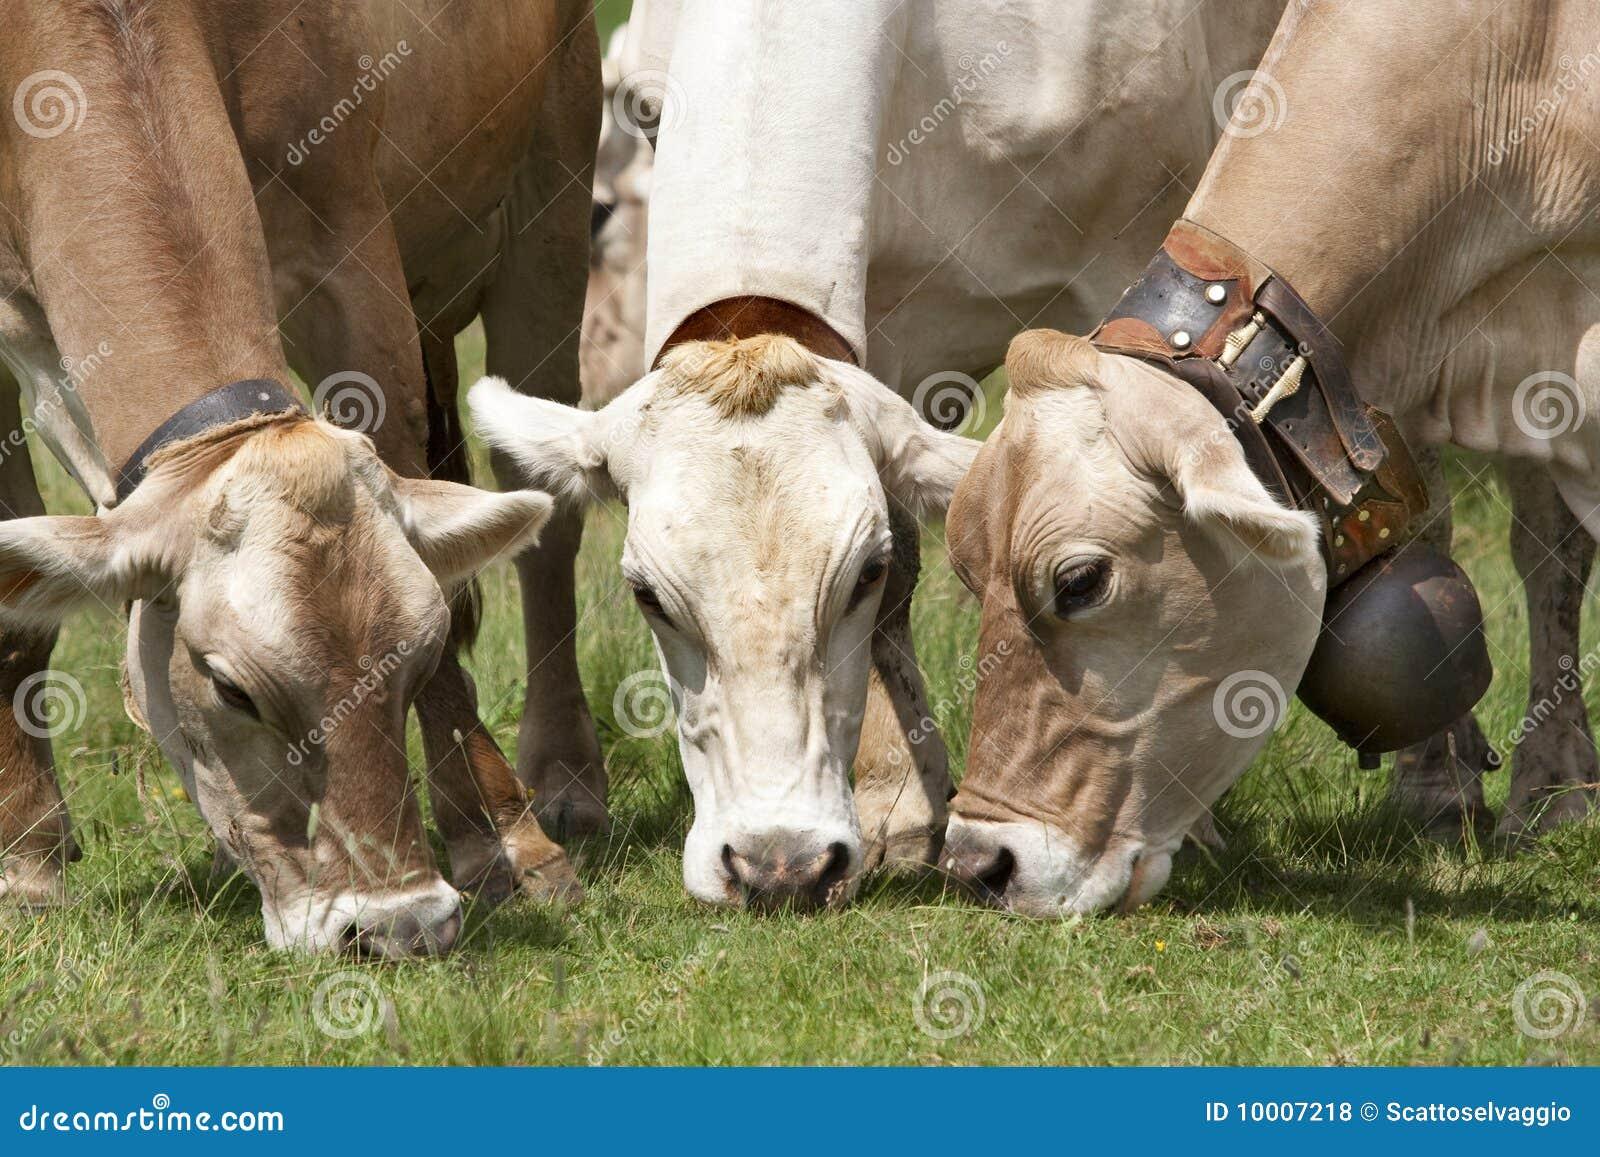 Sunny Beach Farm Studios  Cow Art Equine Artist Larry